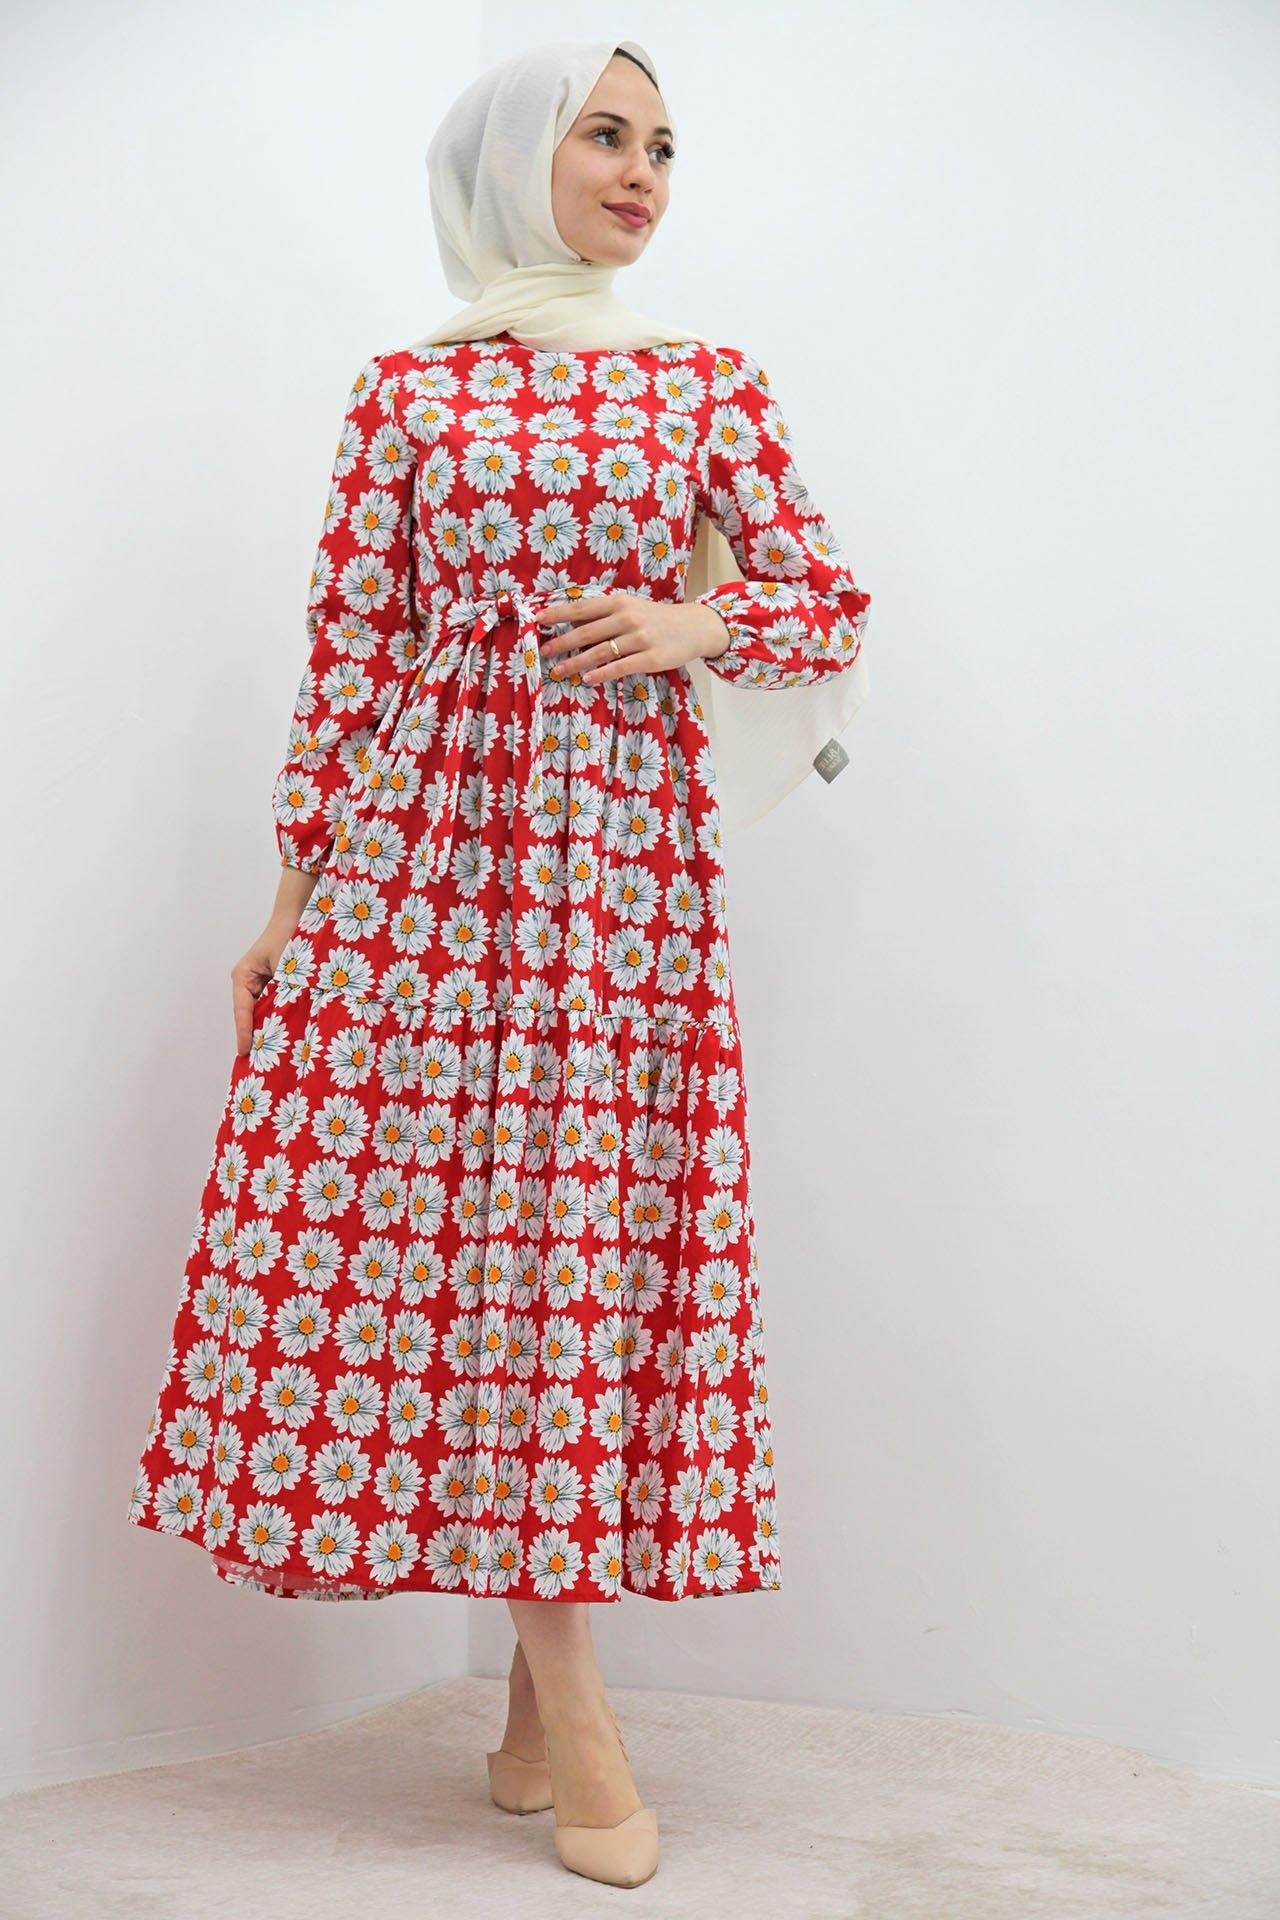 GİZAGİYİM - Beyaz Papatyalı Elbise Kırmızı